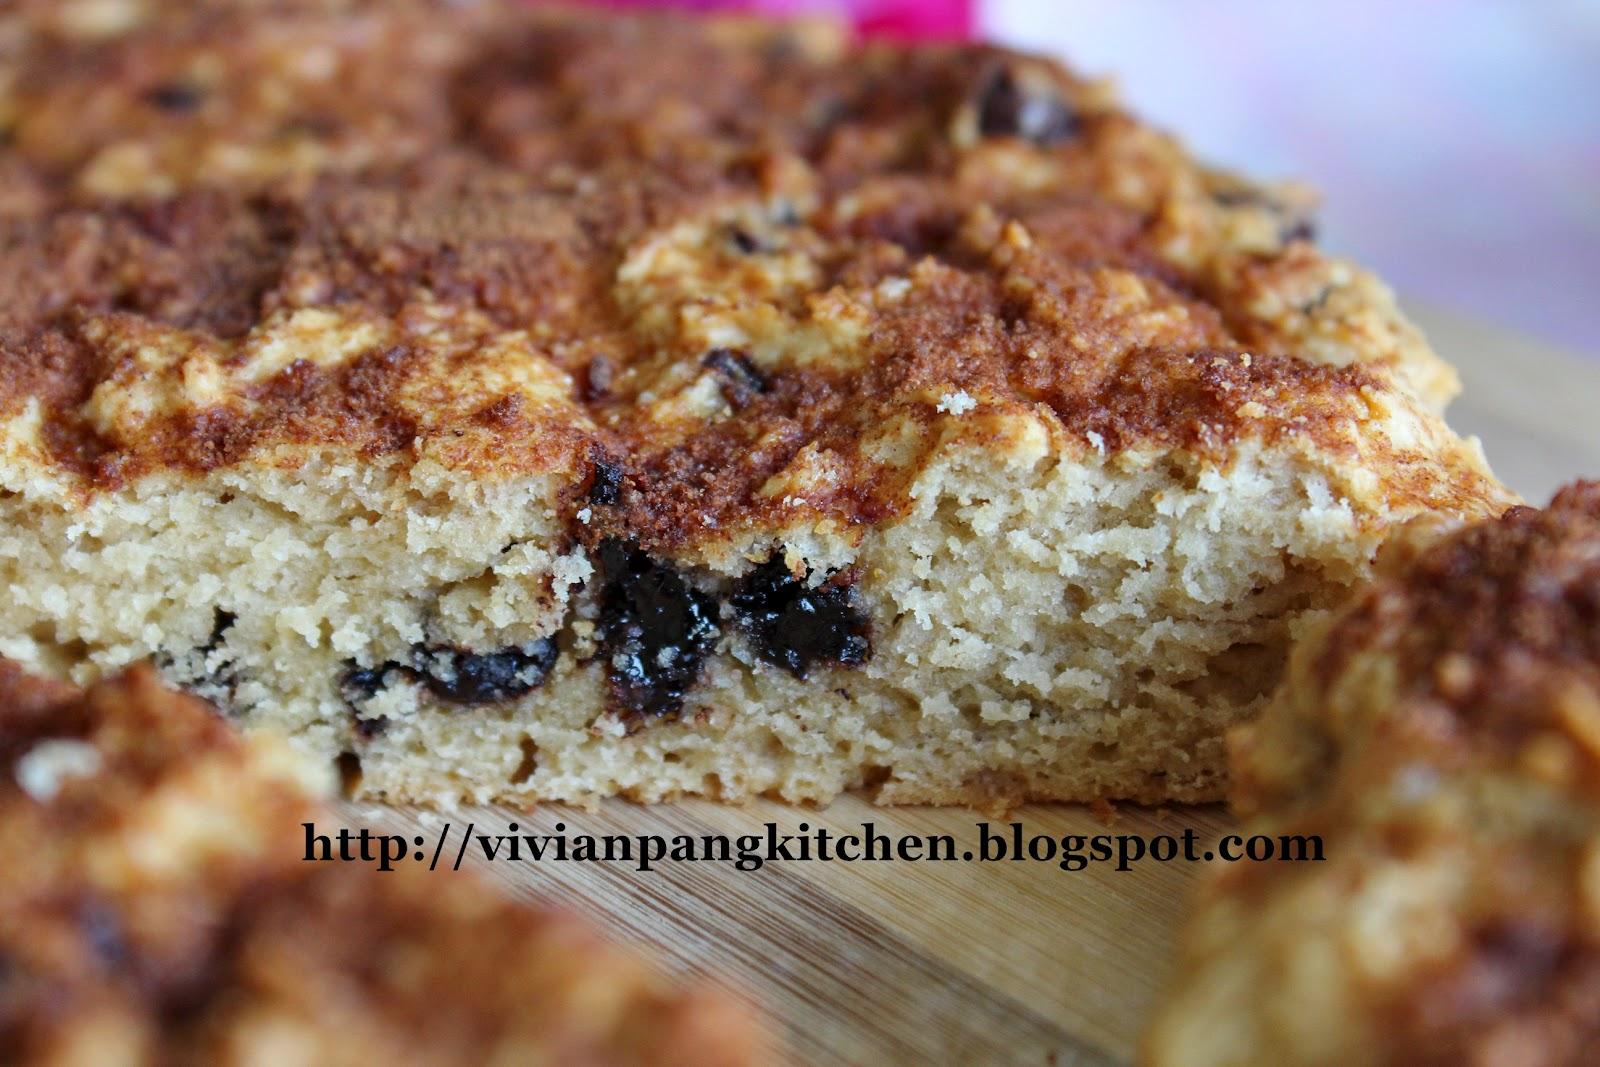 Vivian Pang Kitchen: Mocha Scone with Cinnamon Sugar